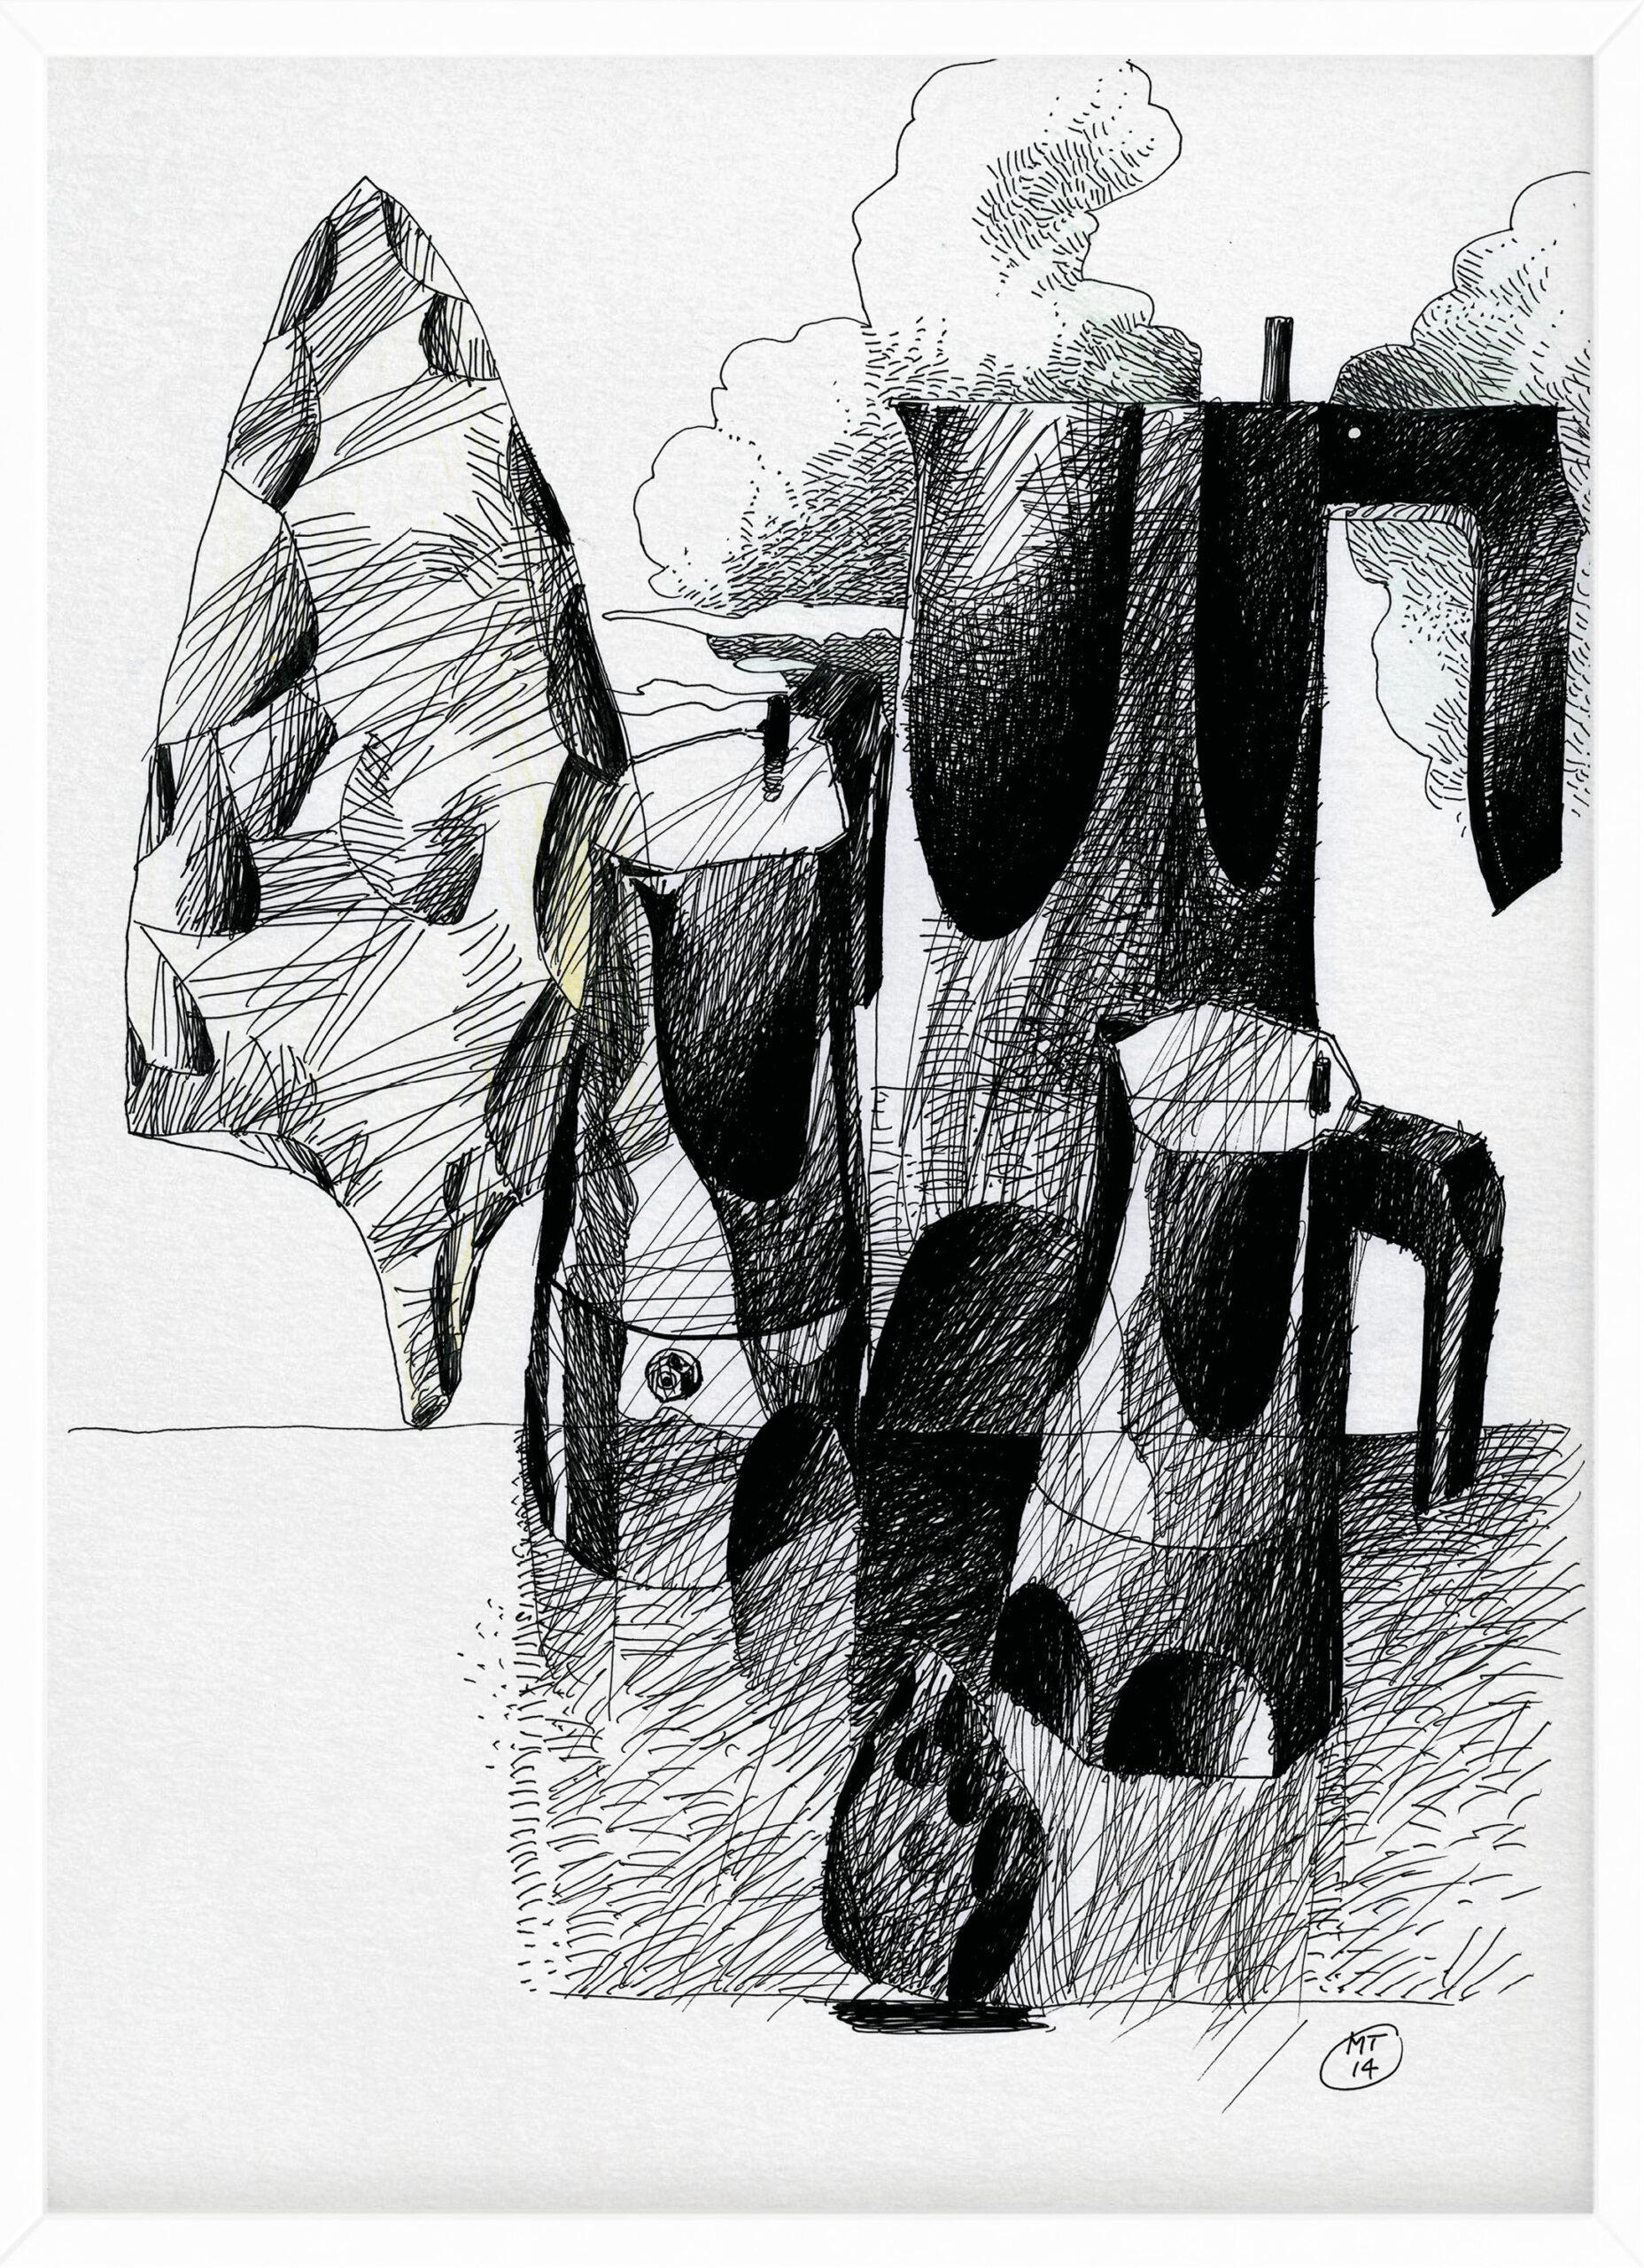 Radical | Drawings | Mario Trimarchi Design2